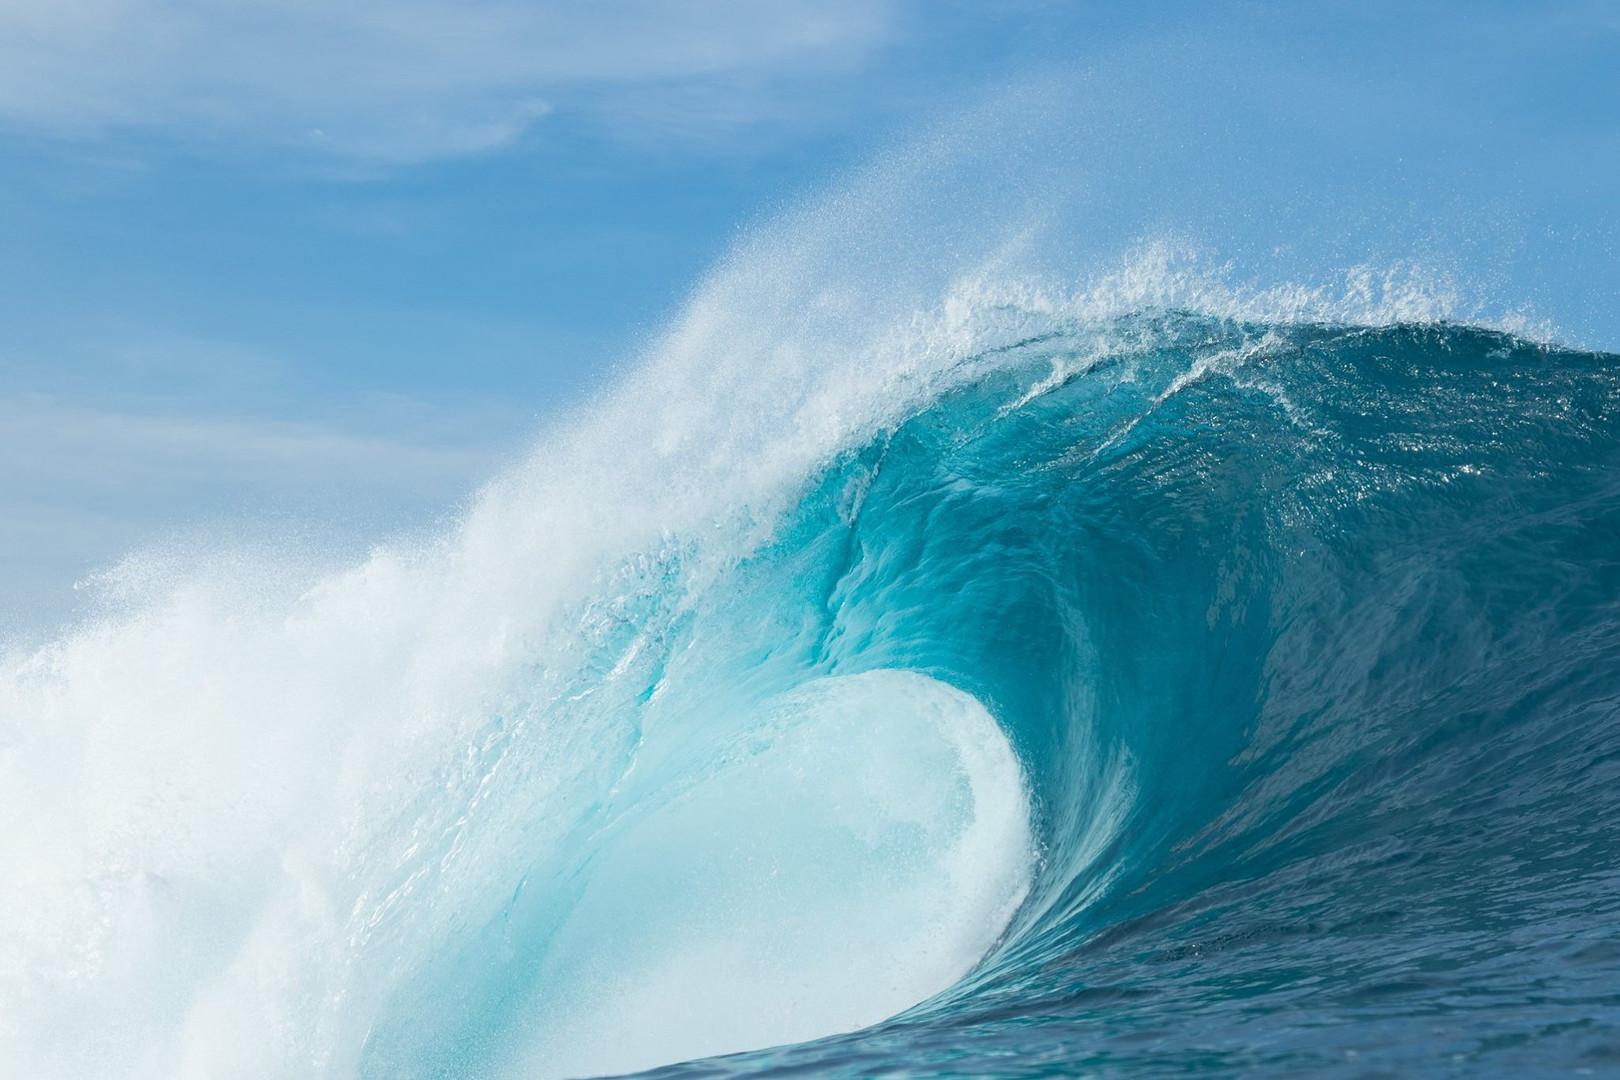 abomb-surf-trip.jpg